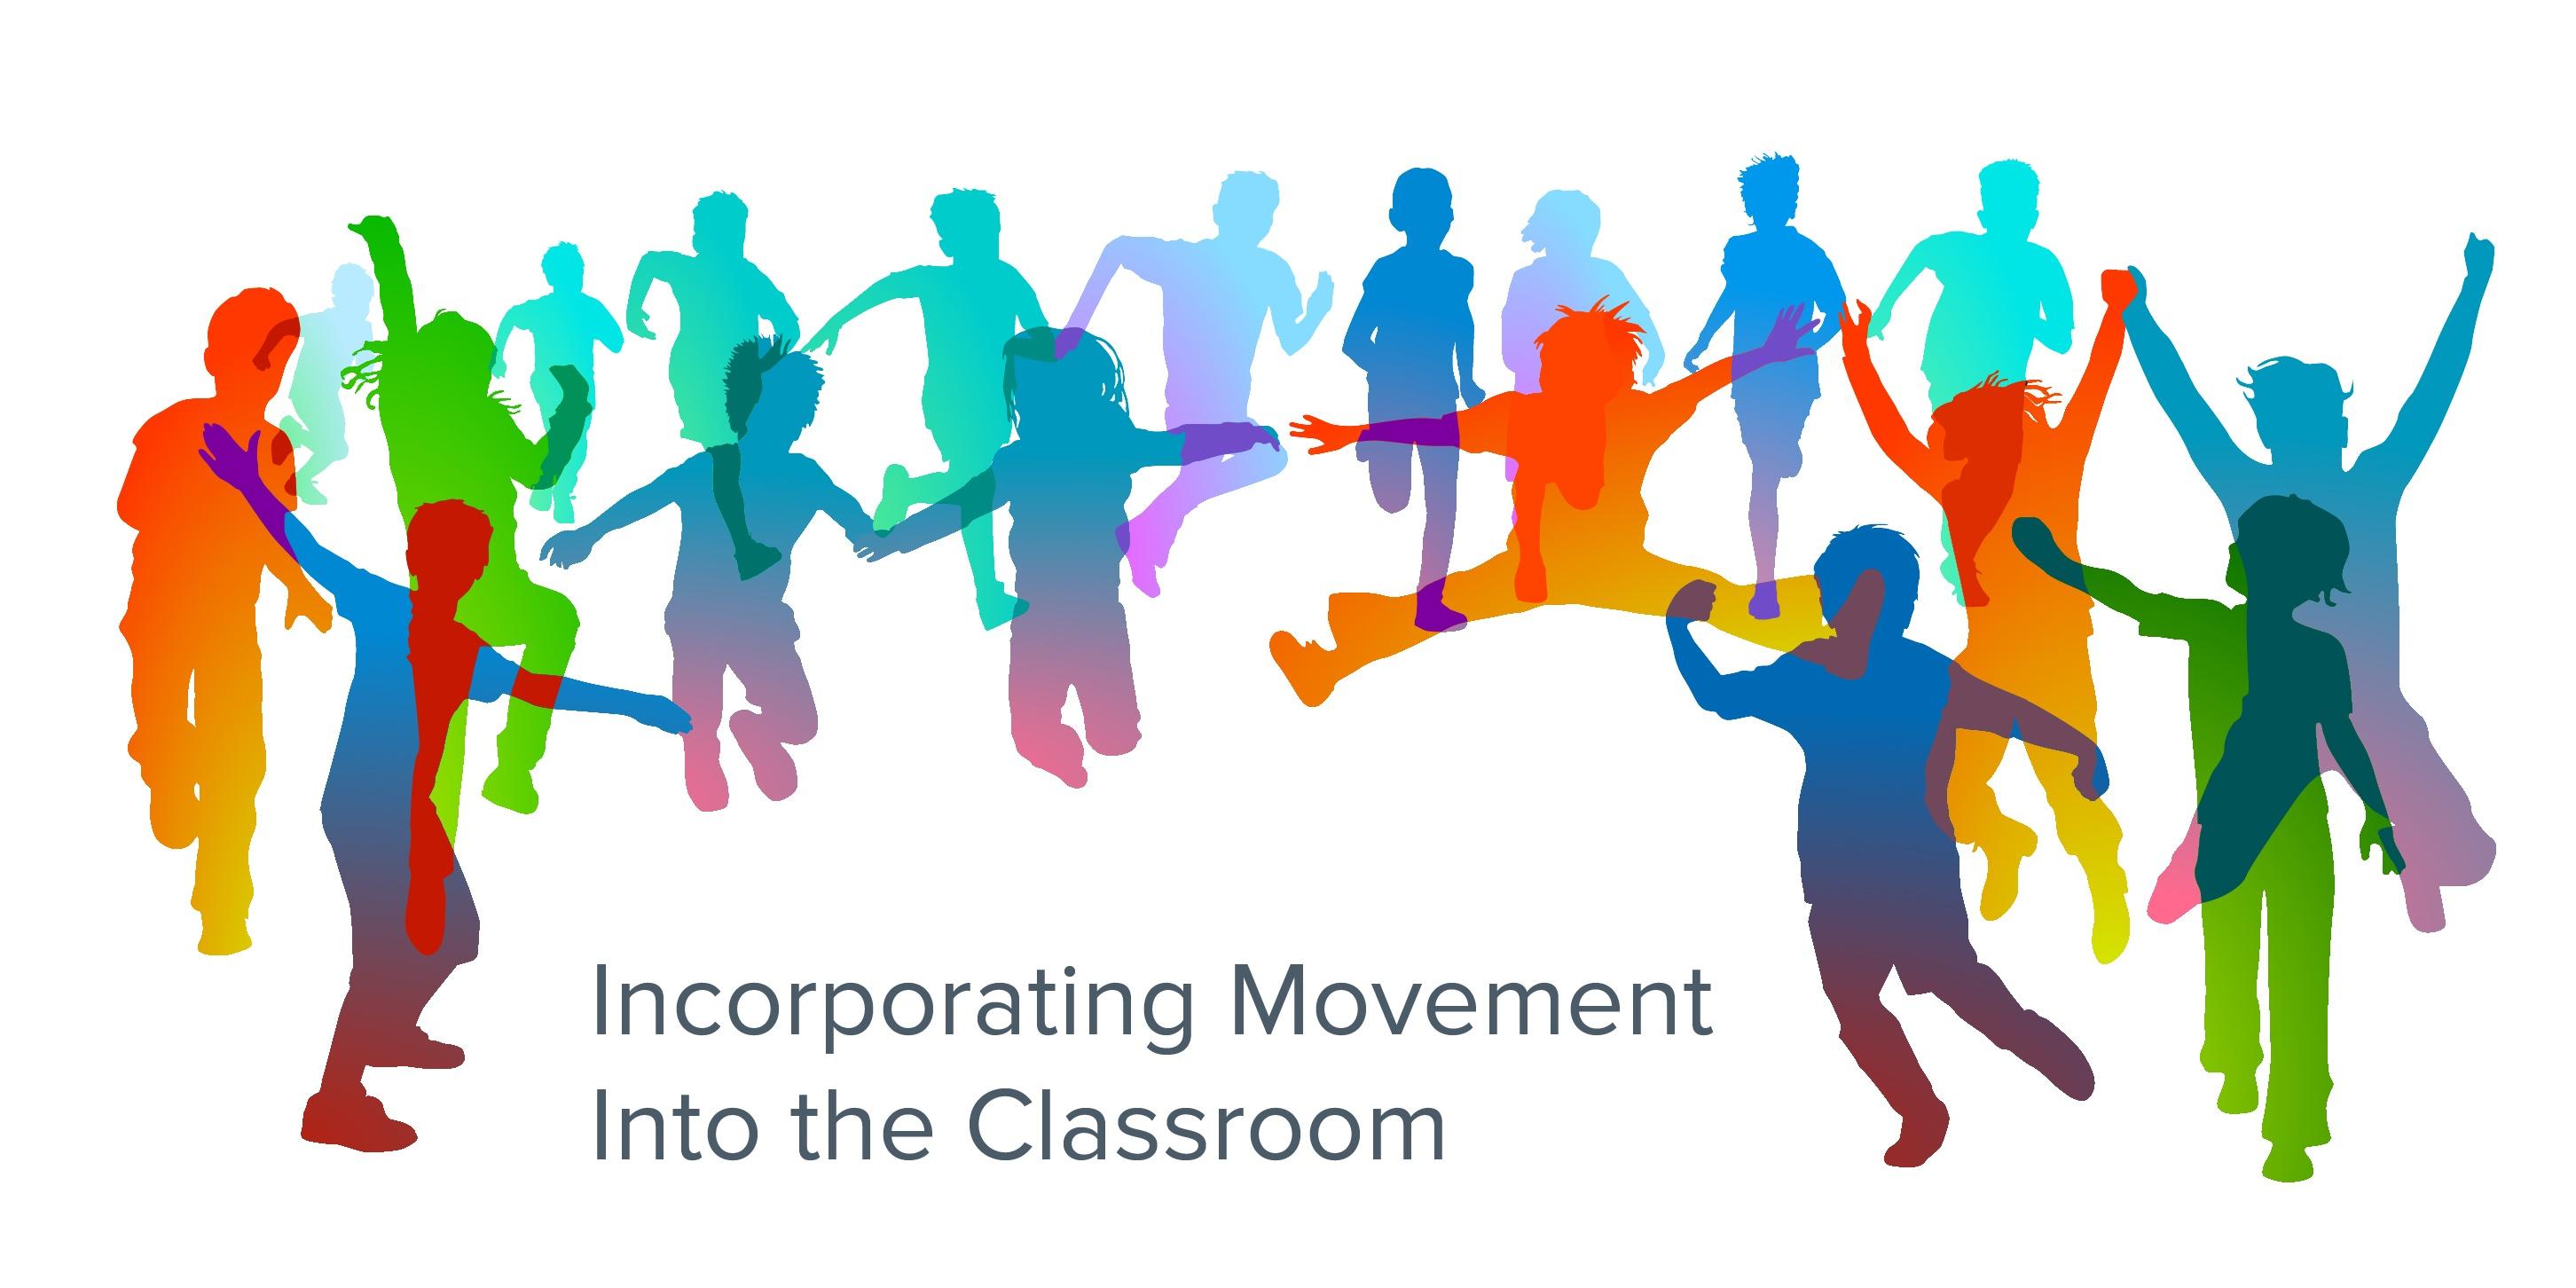 IncorporatingMovementintheClassroom-01.jpg